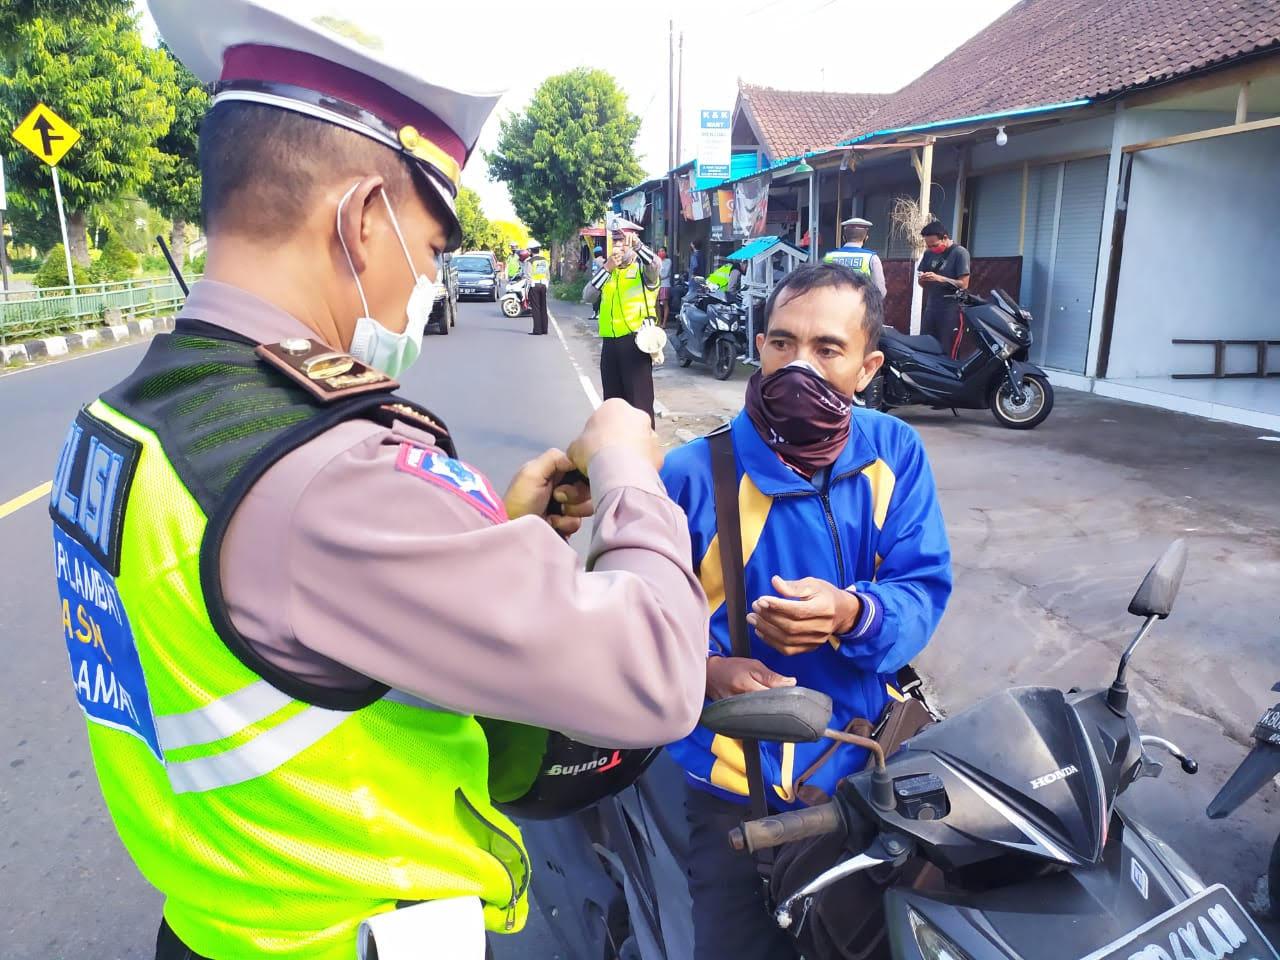 Foto: OPERASI PATUH LEMPUYANG OPERASI Patuh Lempuyang 2020 di Jalan Tulikup Gianyar. Foto: adi